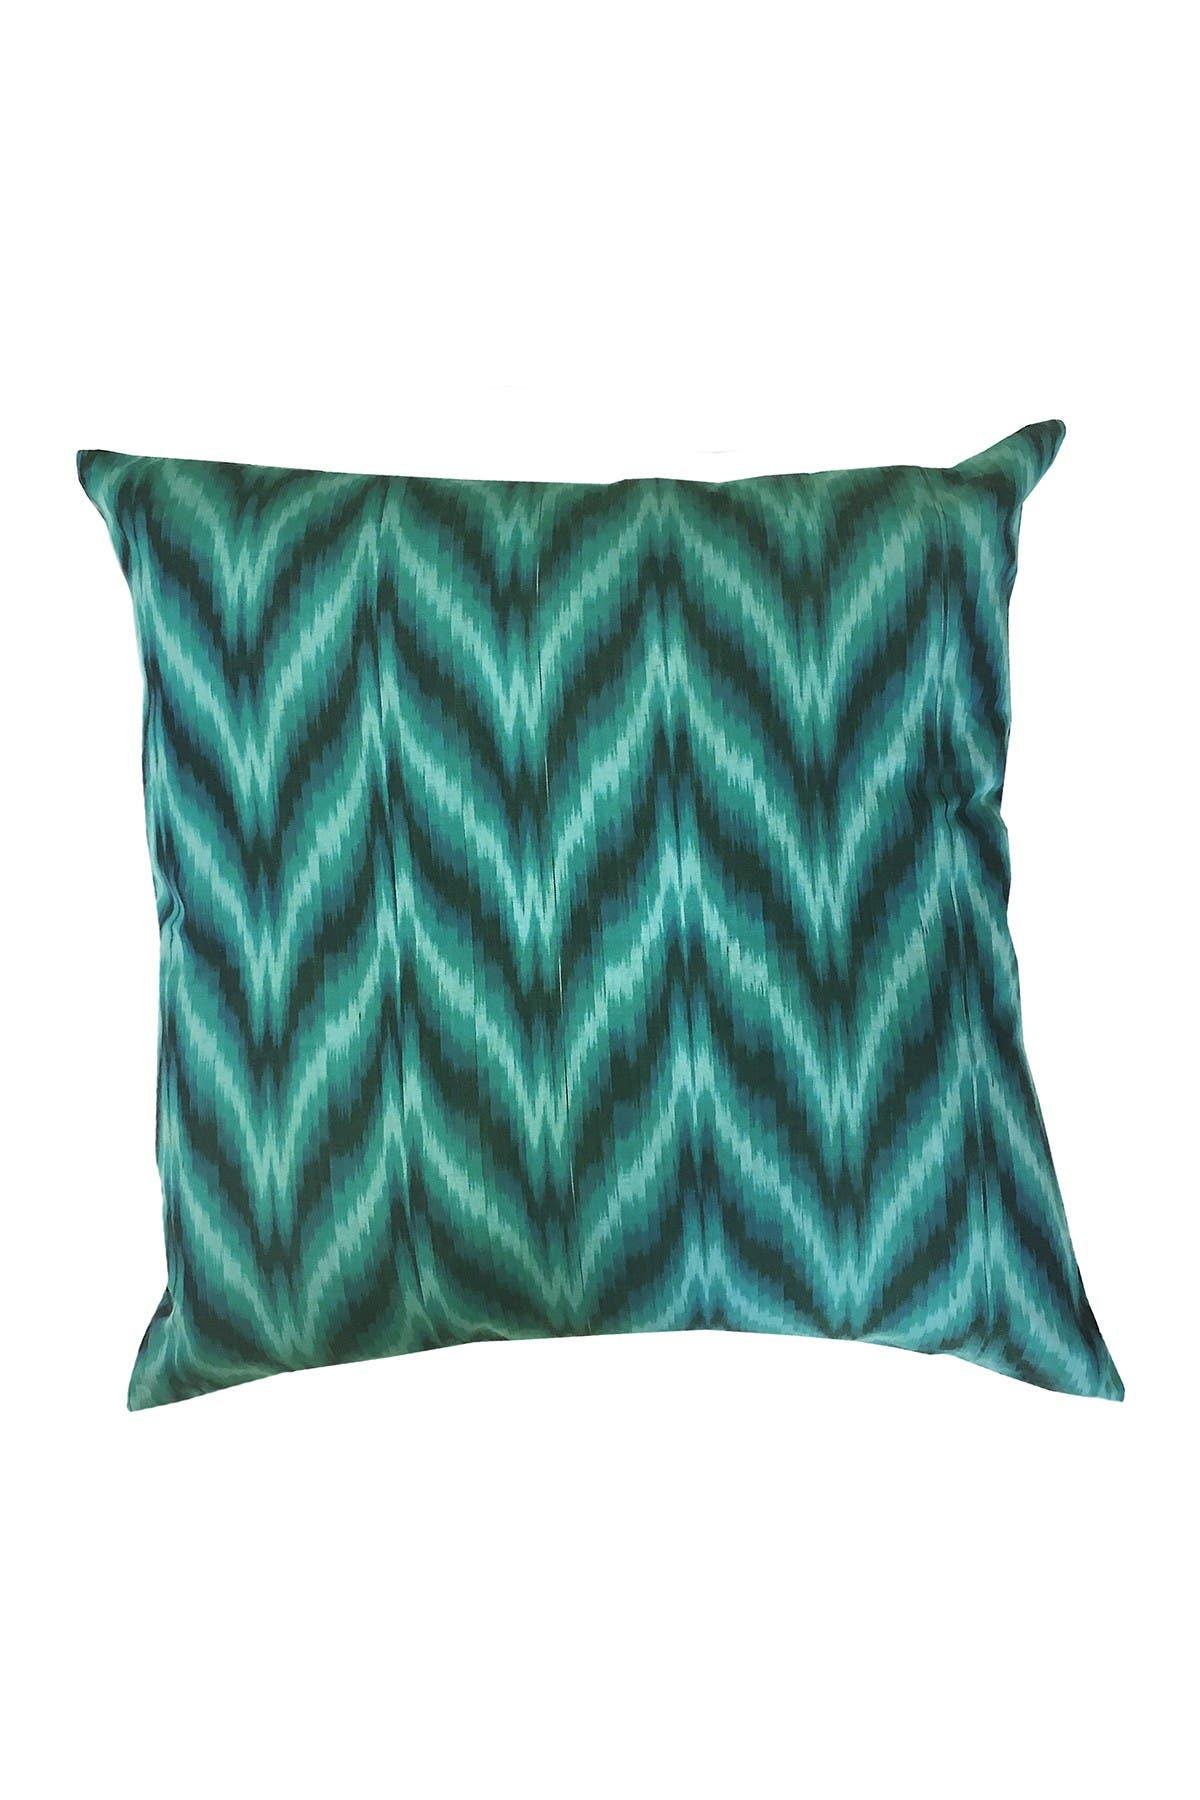 "Image of DIVINE HOME Green & Black Chevron Throw Pillow - 20""x20"""